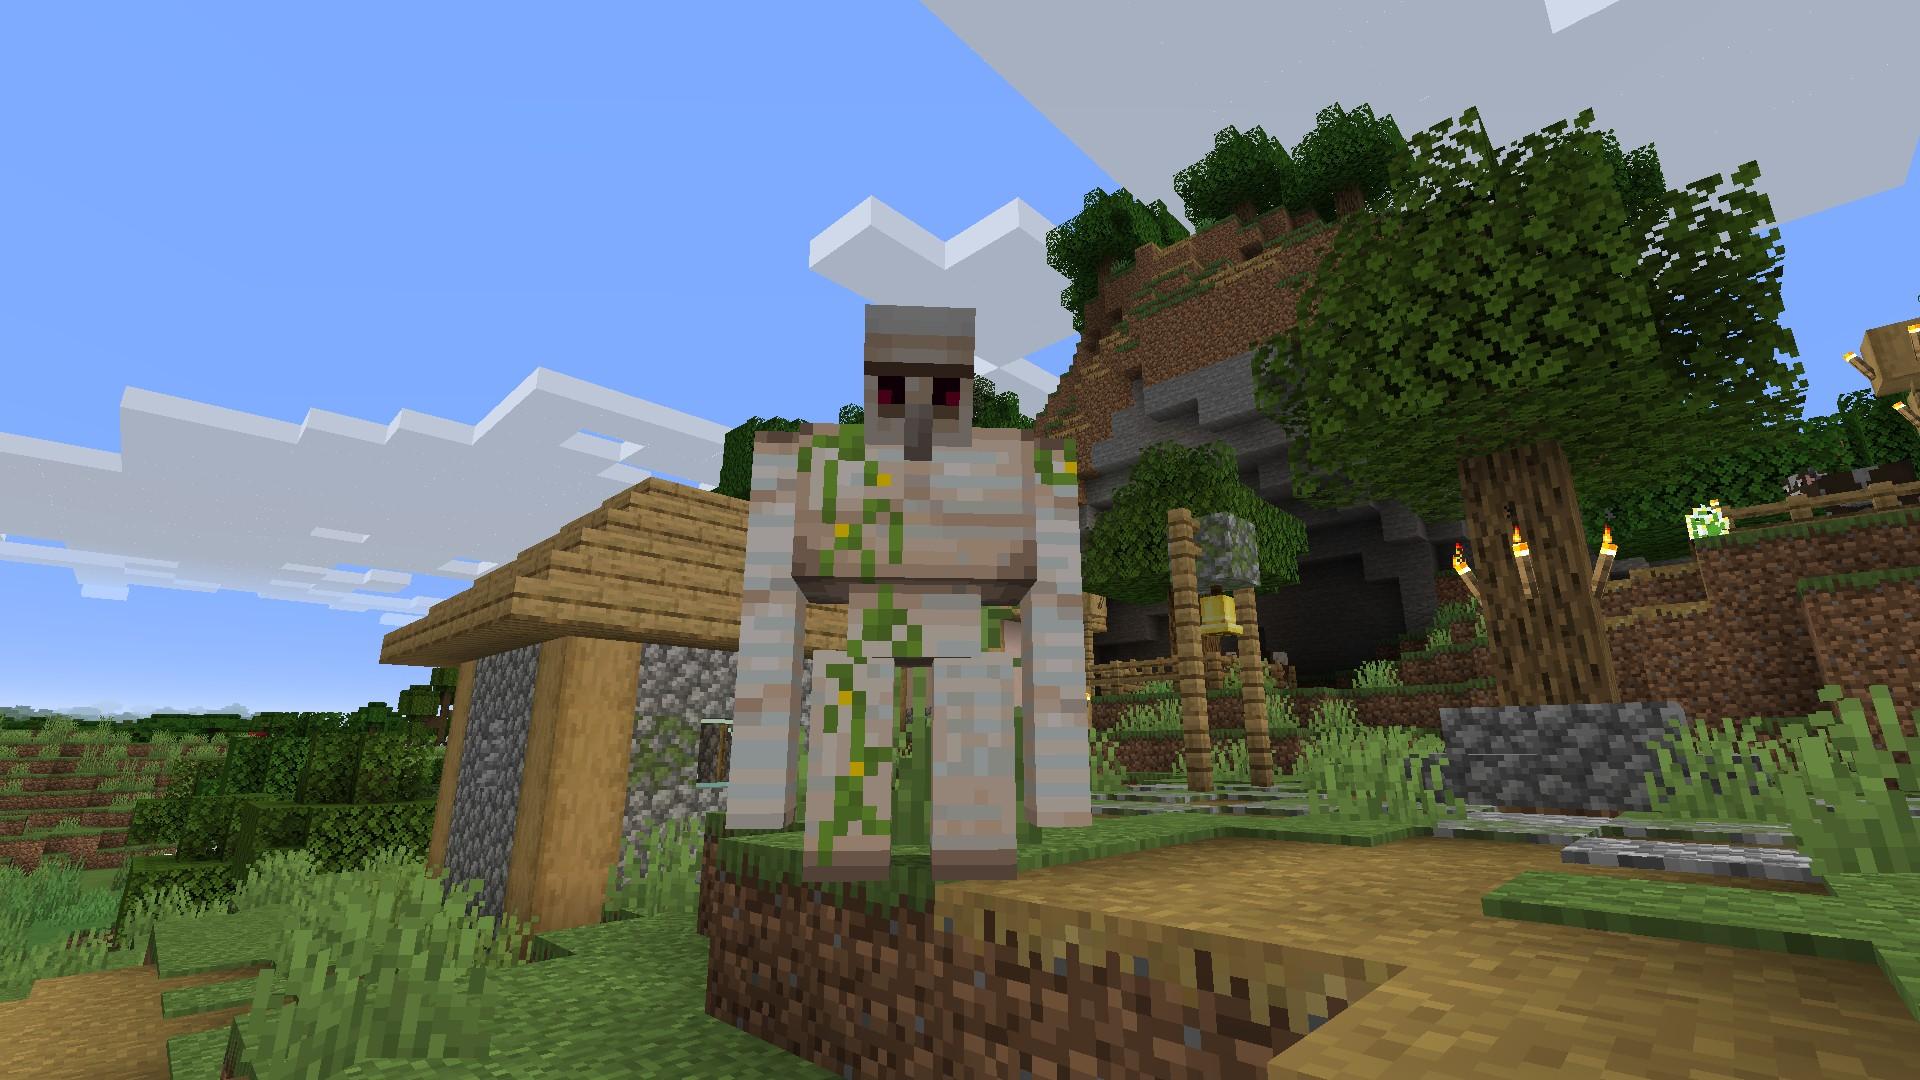 Minecraft Iron Golem farm guide